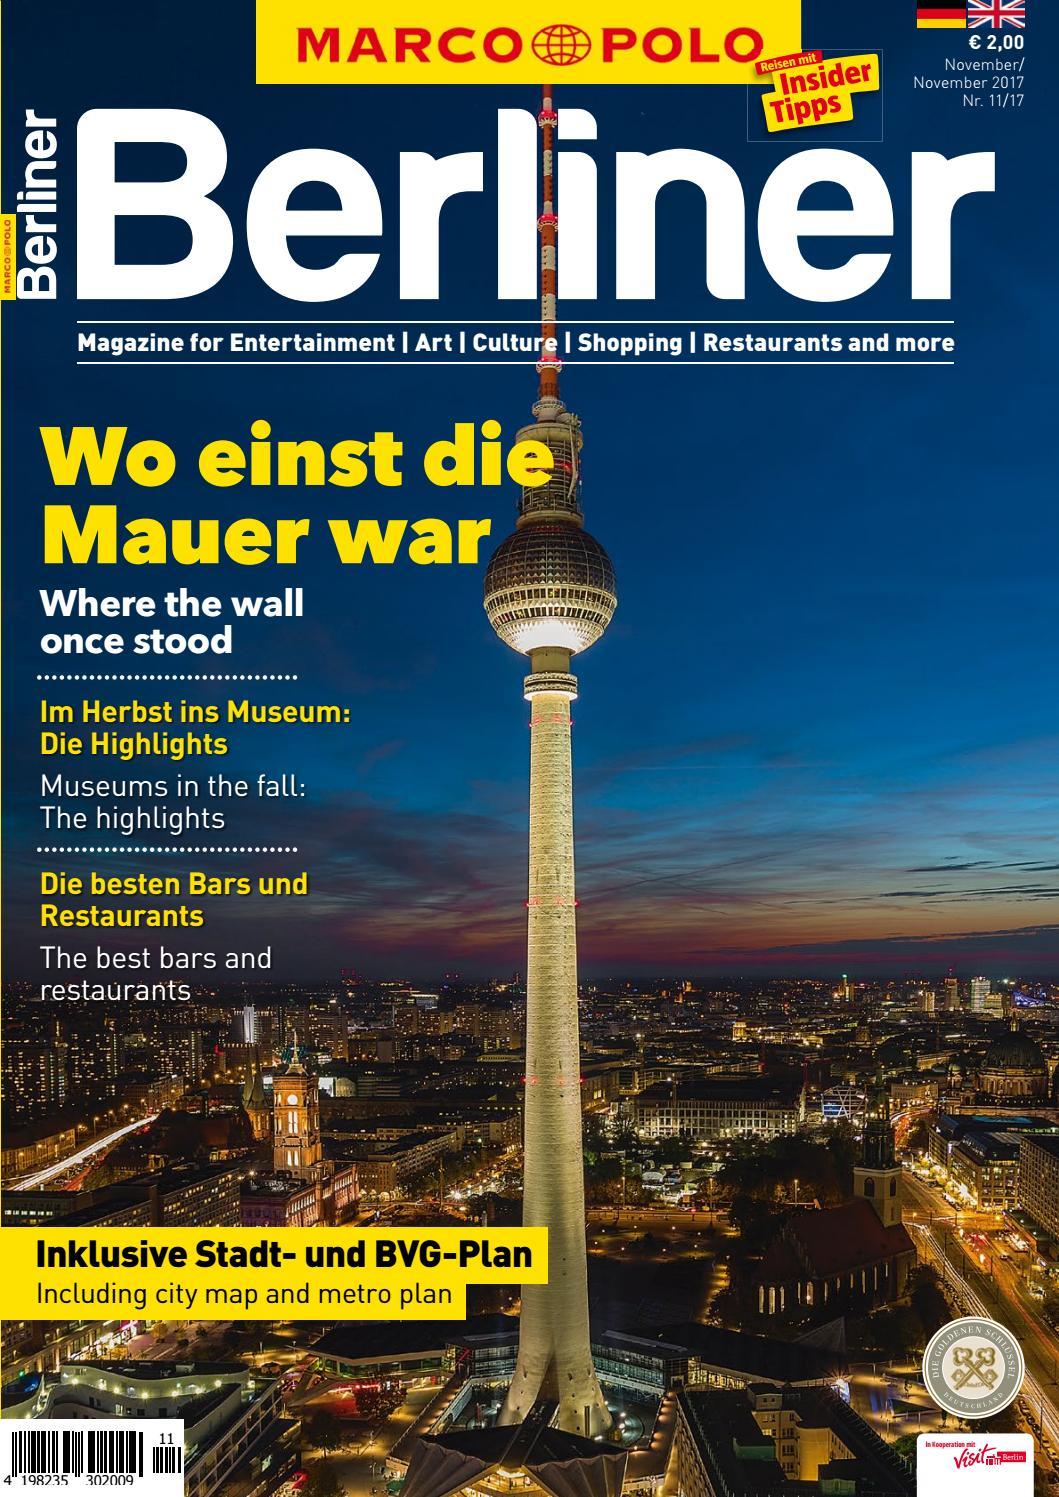 Marco Polo Berliner 11/17 by Berlin Medien GmbH - issuu